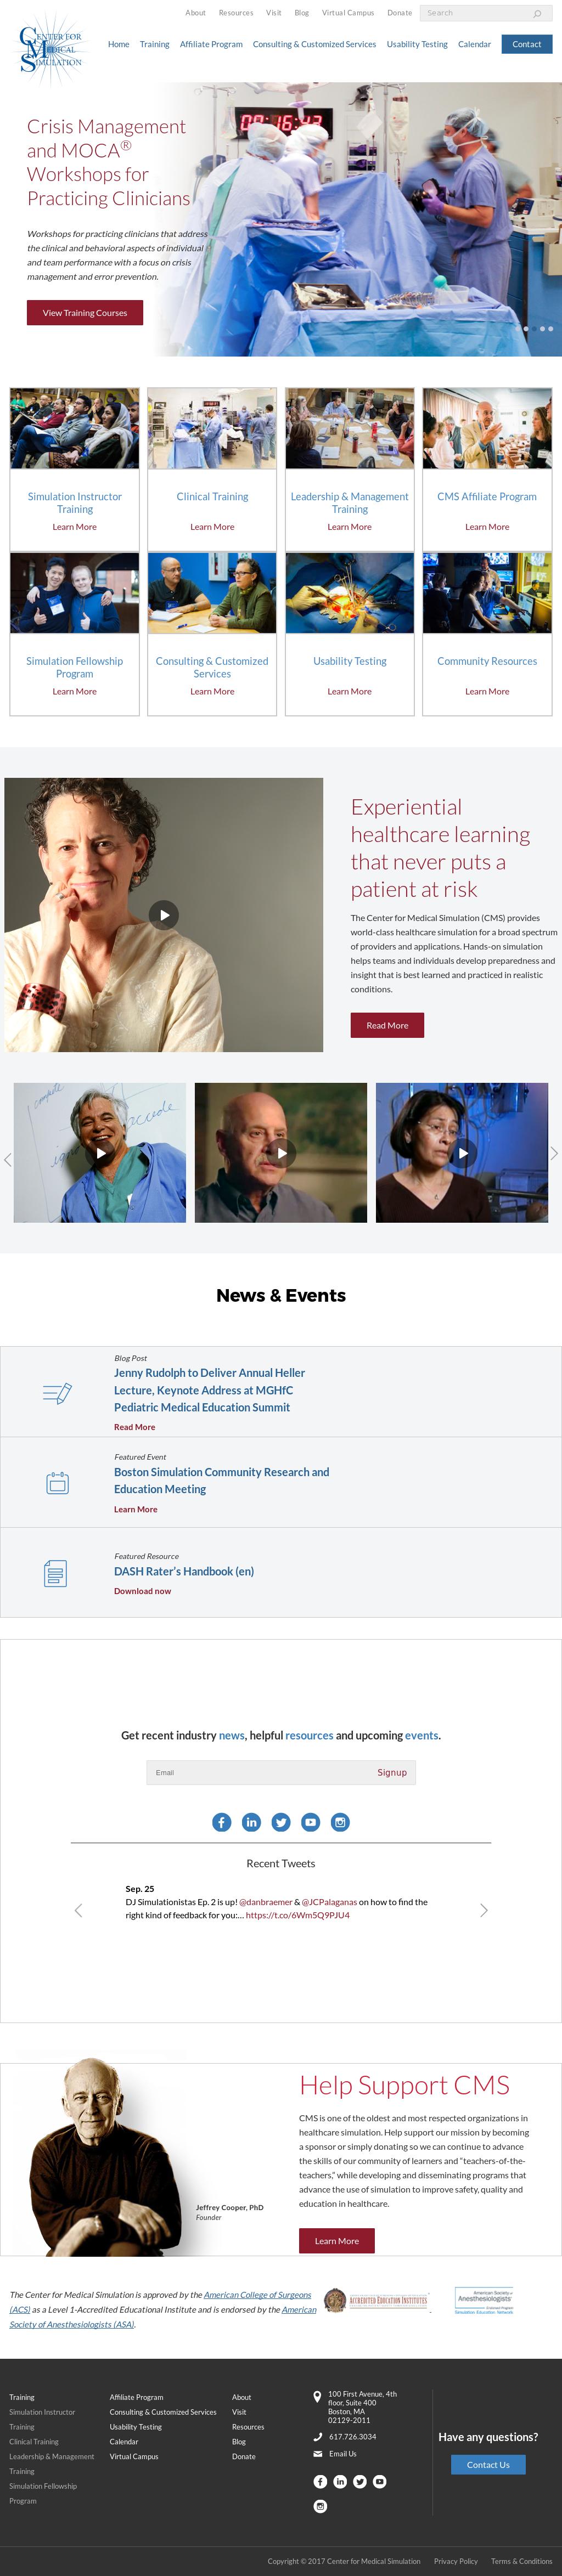 Harvardmedsim Competitors, Revenue and Employees - Owler Company Profile